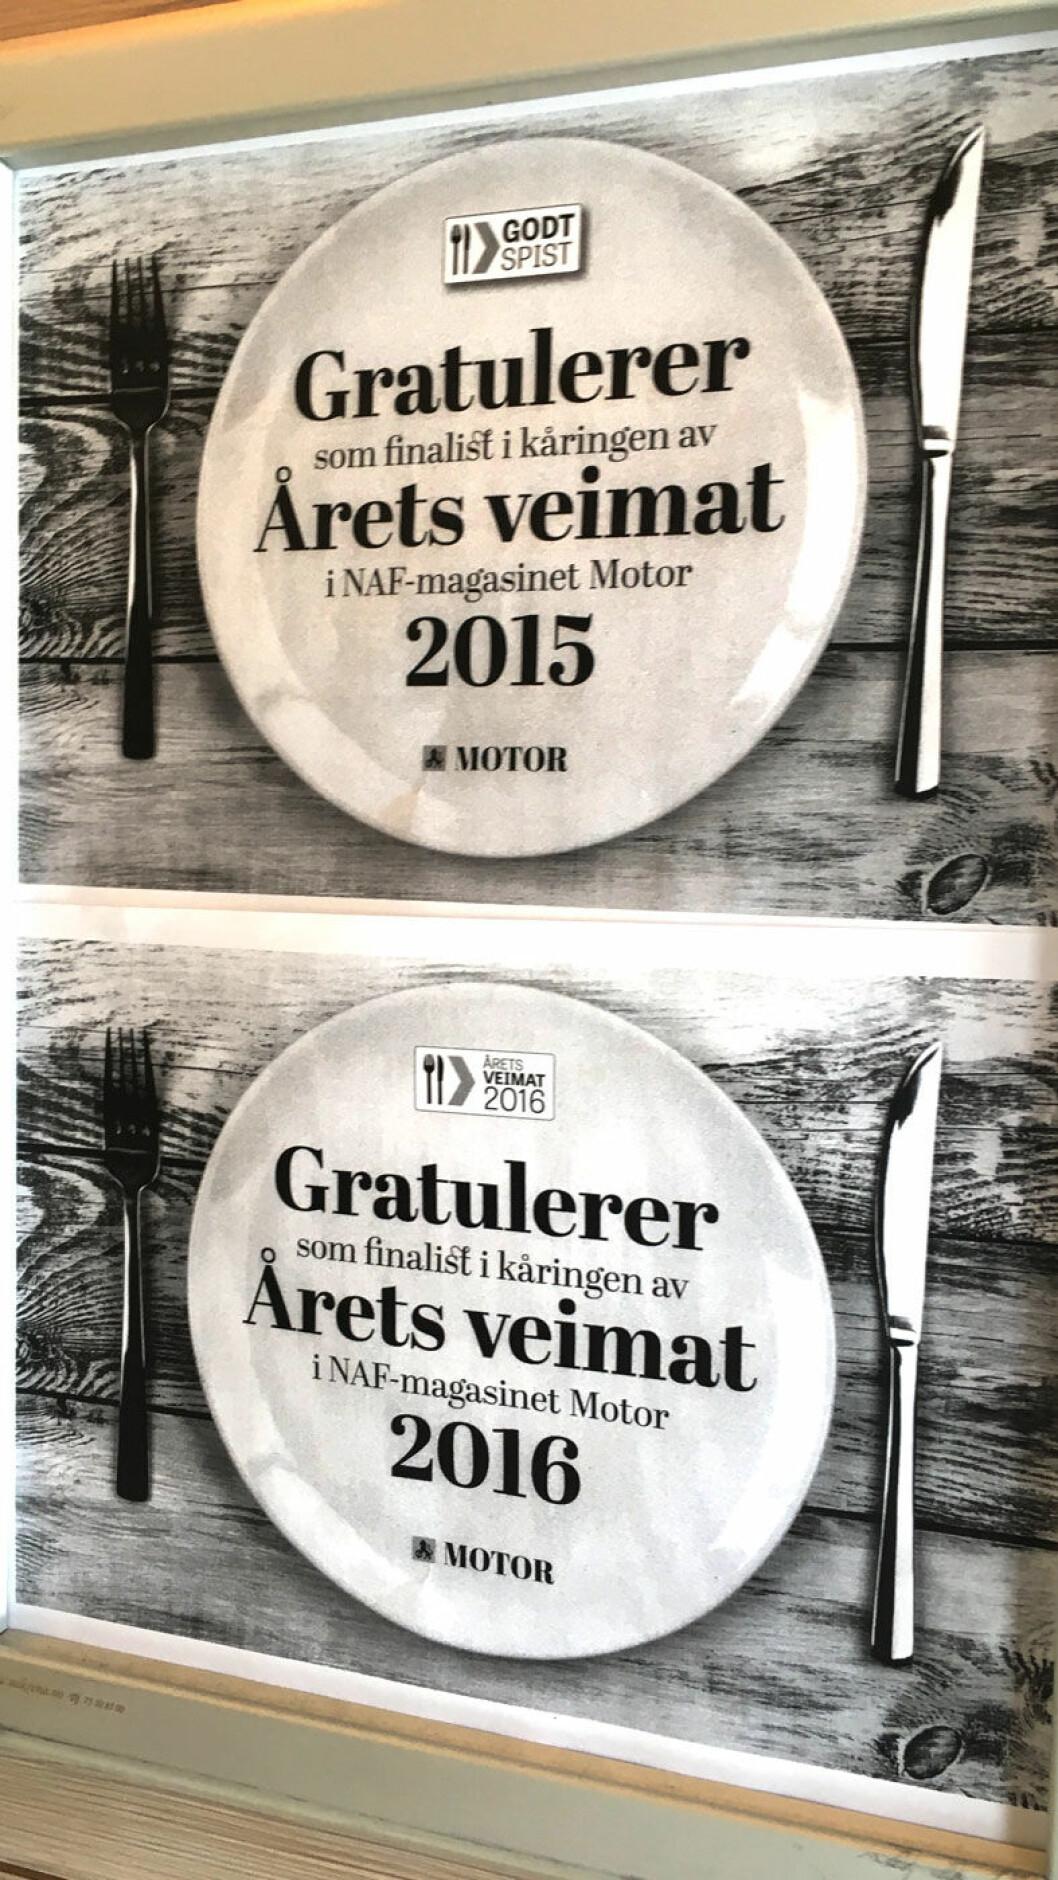 TYDELIG BEVIS: Diplomer fra Motors veimatkåring i inngangspartiet på Skeid kro.